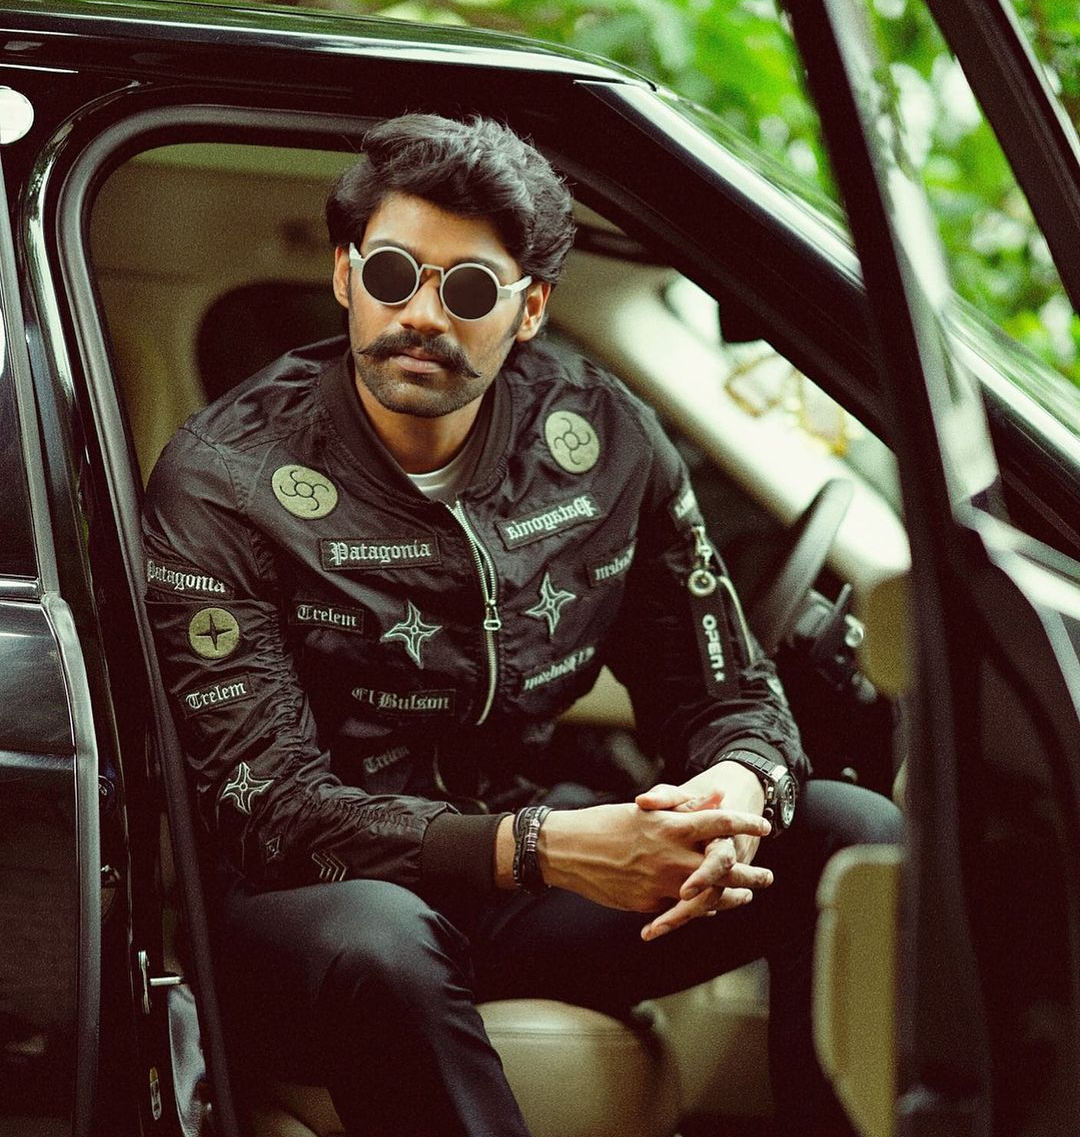 Bellamkonda Sai Srinivas In Official Remake Of Dhanush's Blockbuster Karnan